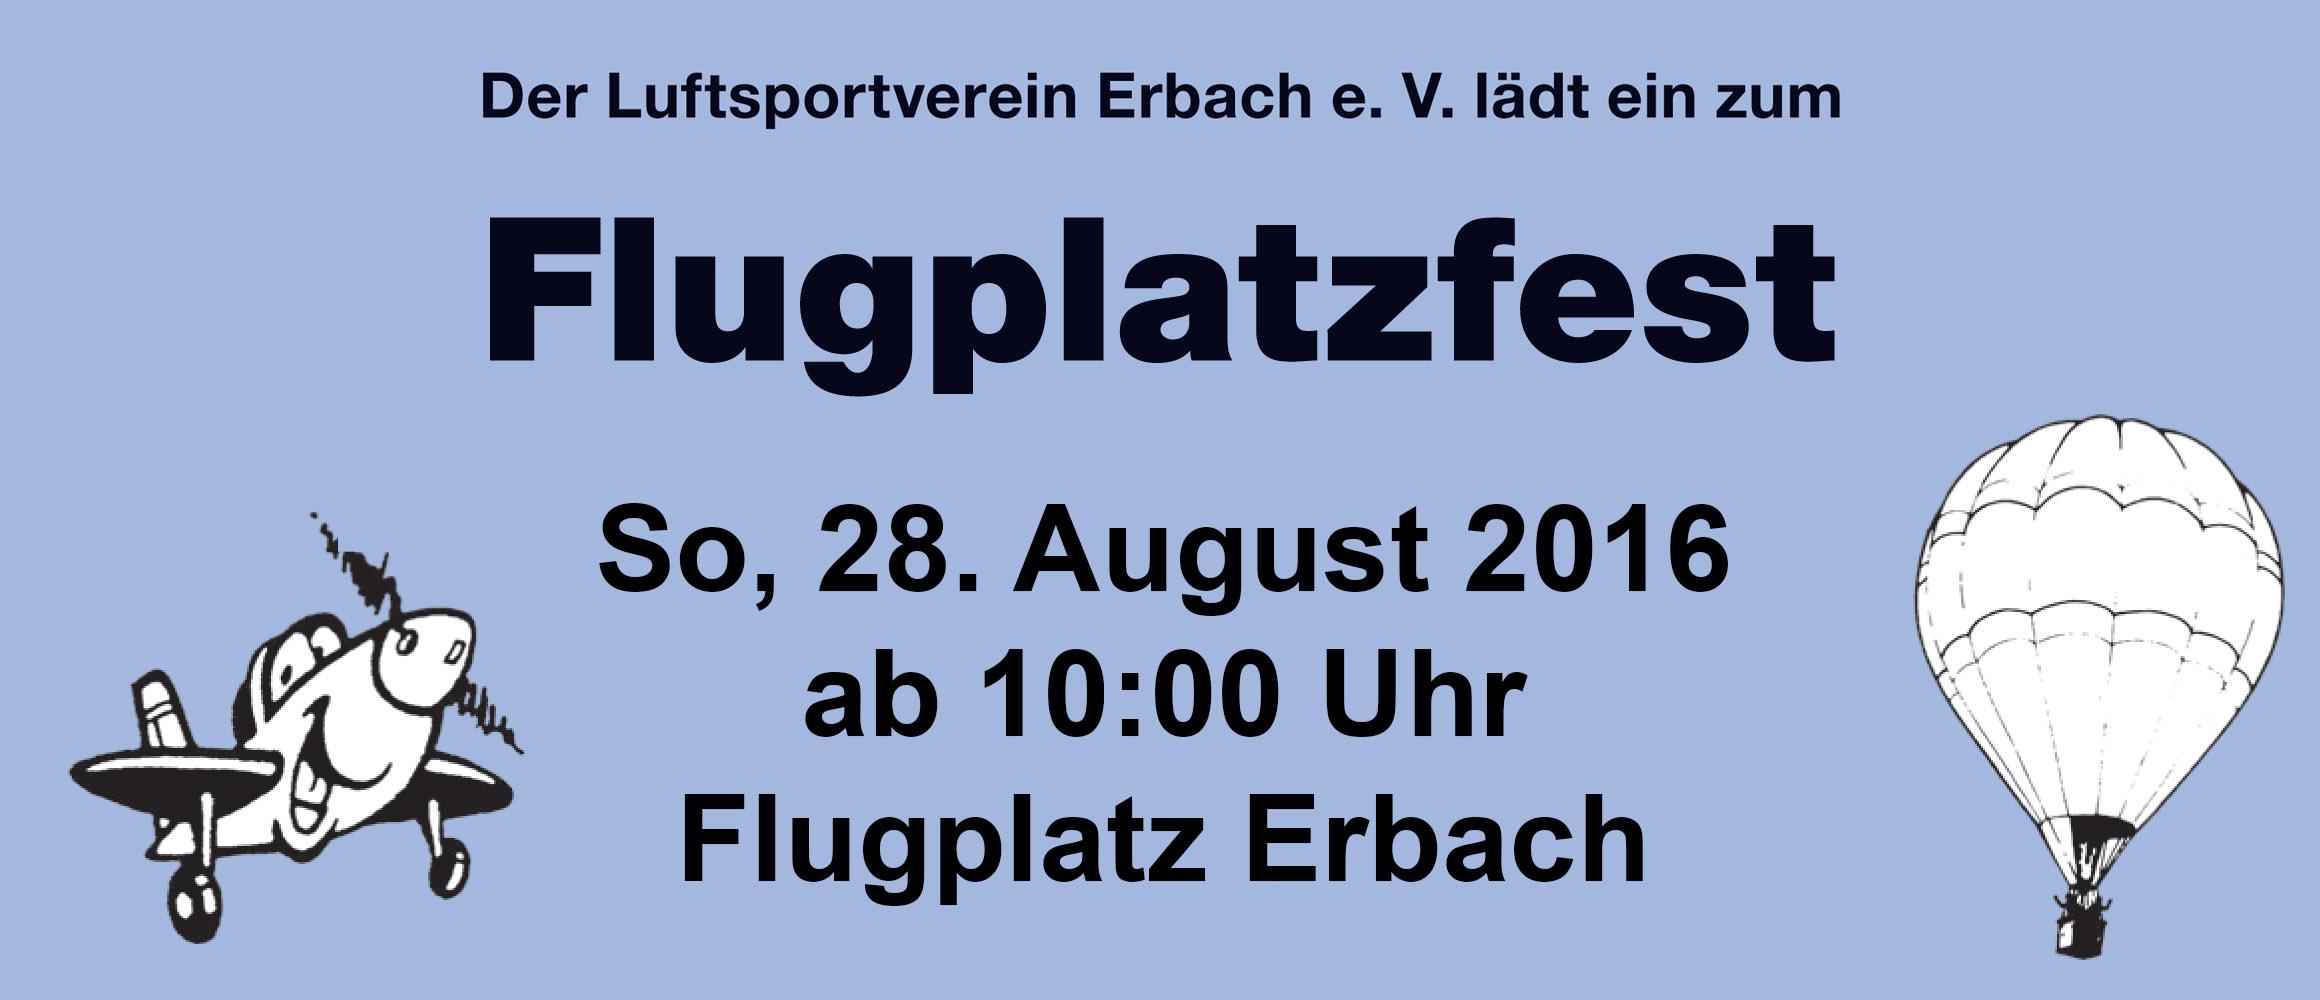 Flugplatzfest LSV Erbach 28.08.2016